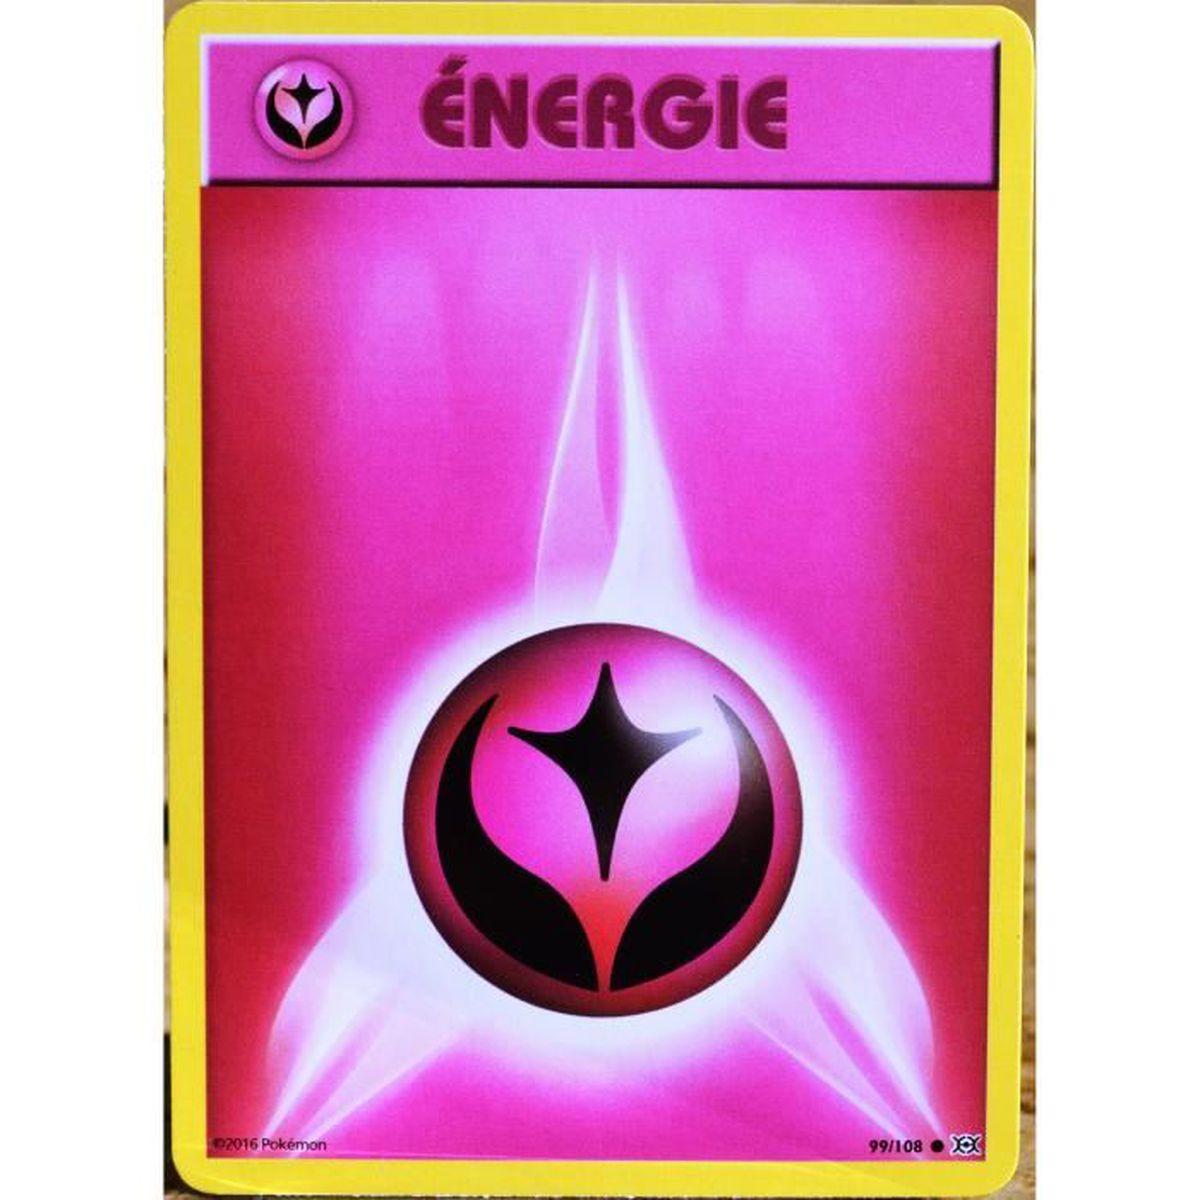 Carte pok mon 99 108 energie f e xy evolutions achat vente carte a collectionner cdiscount - Carte pokemon fee ...